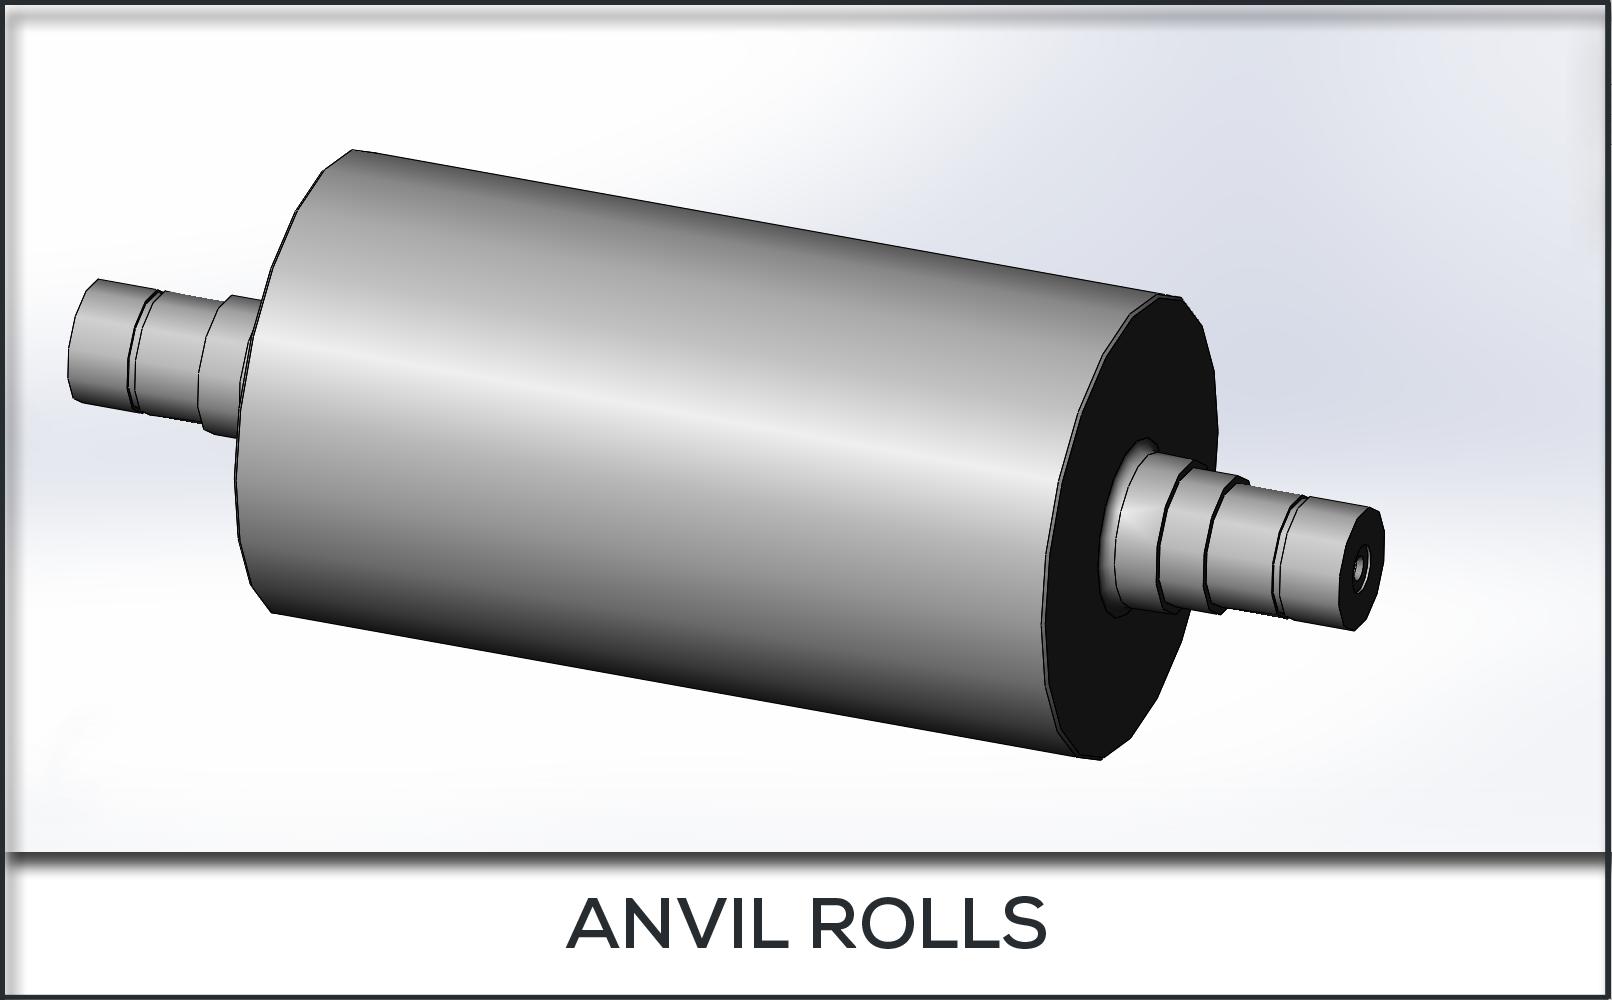 Anvil Rolls